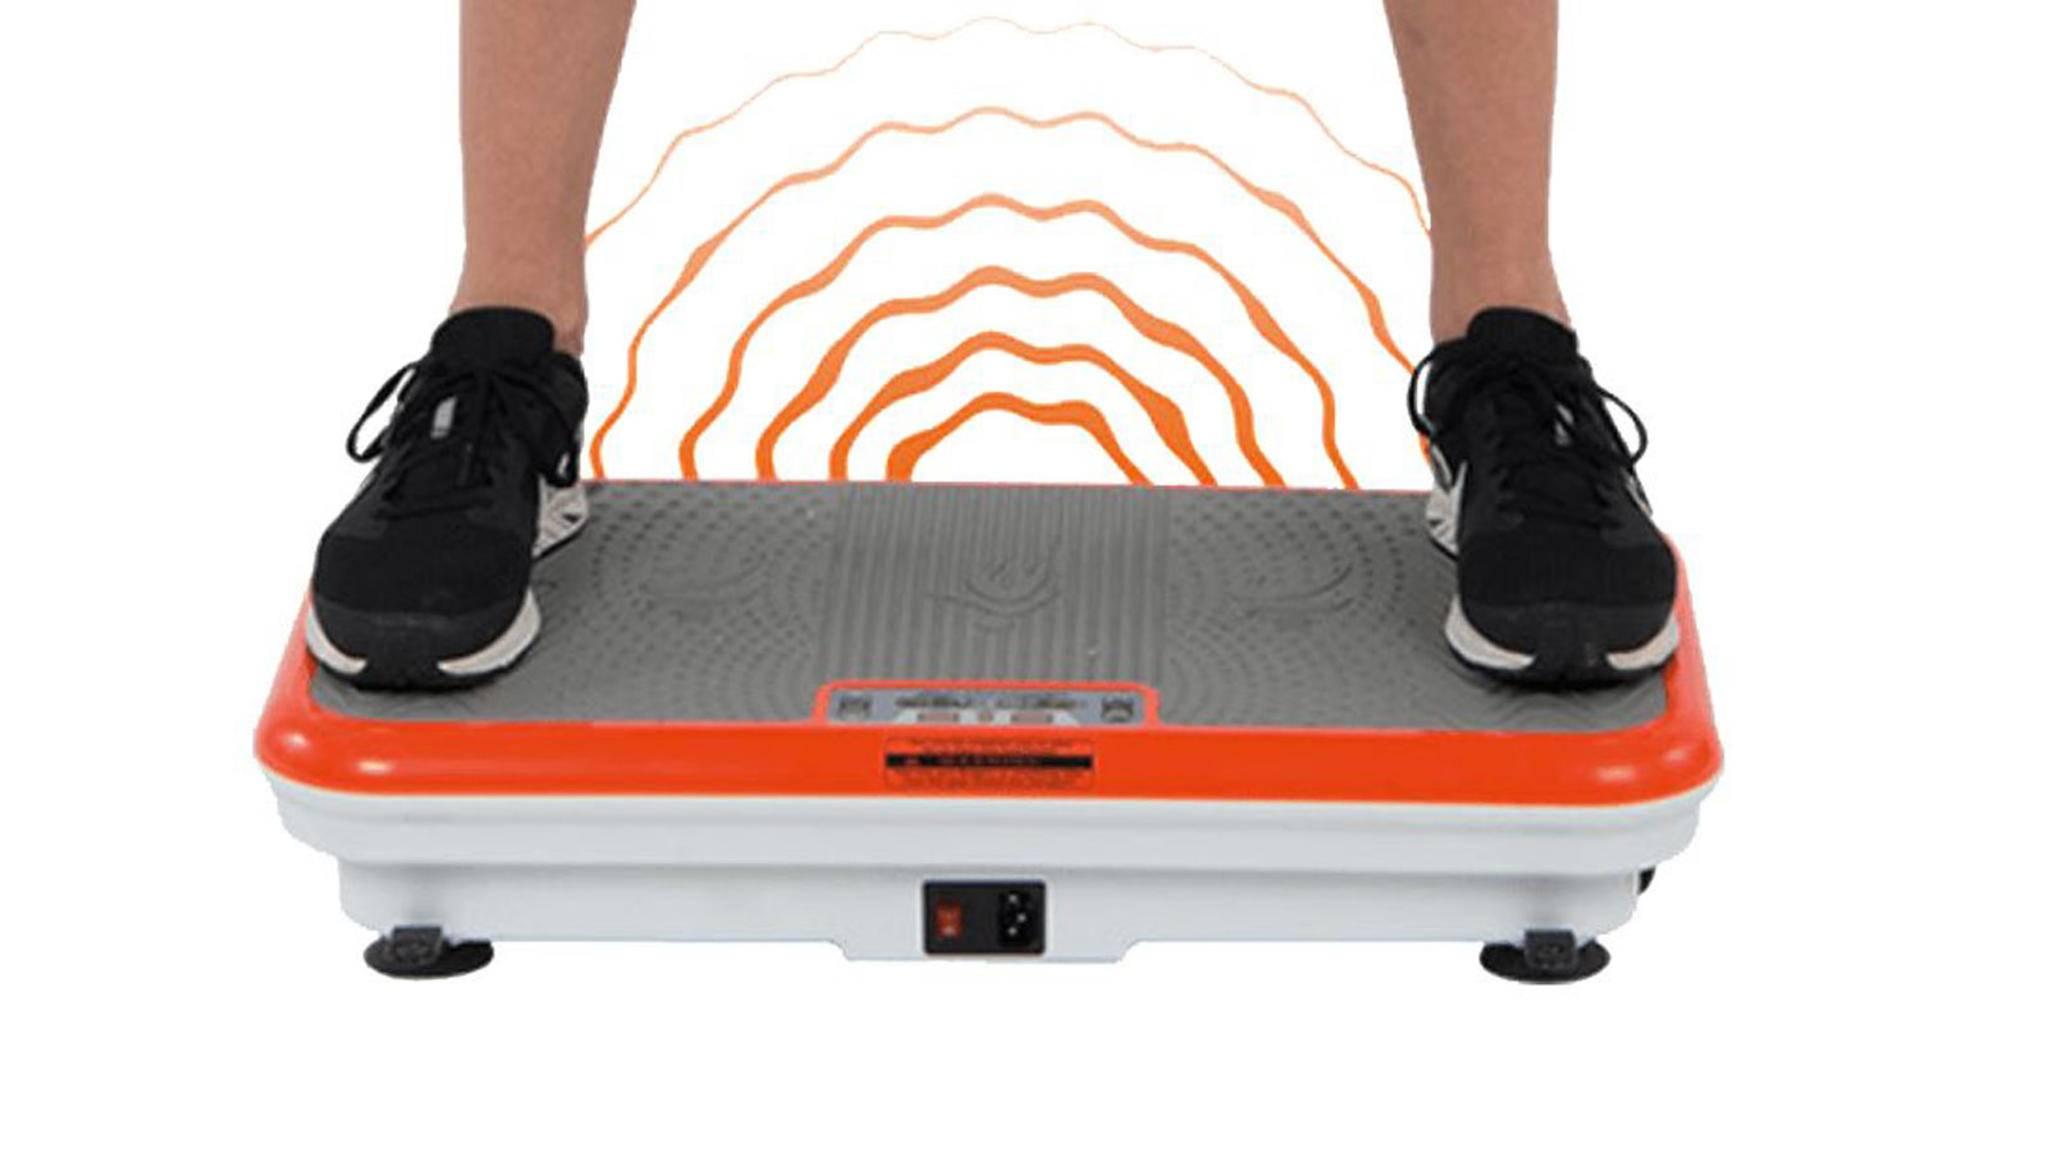 Die Vibrationsplatte Vibro Shaper soll das ultimative Fitness-Gadget sein.